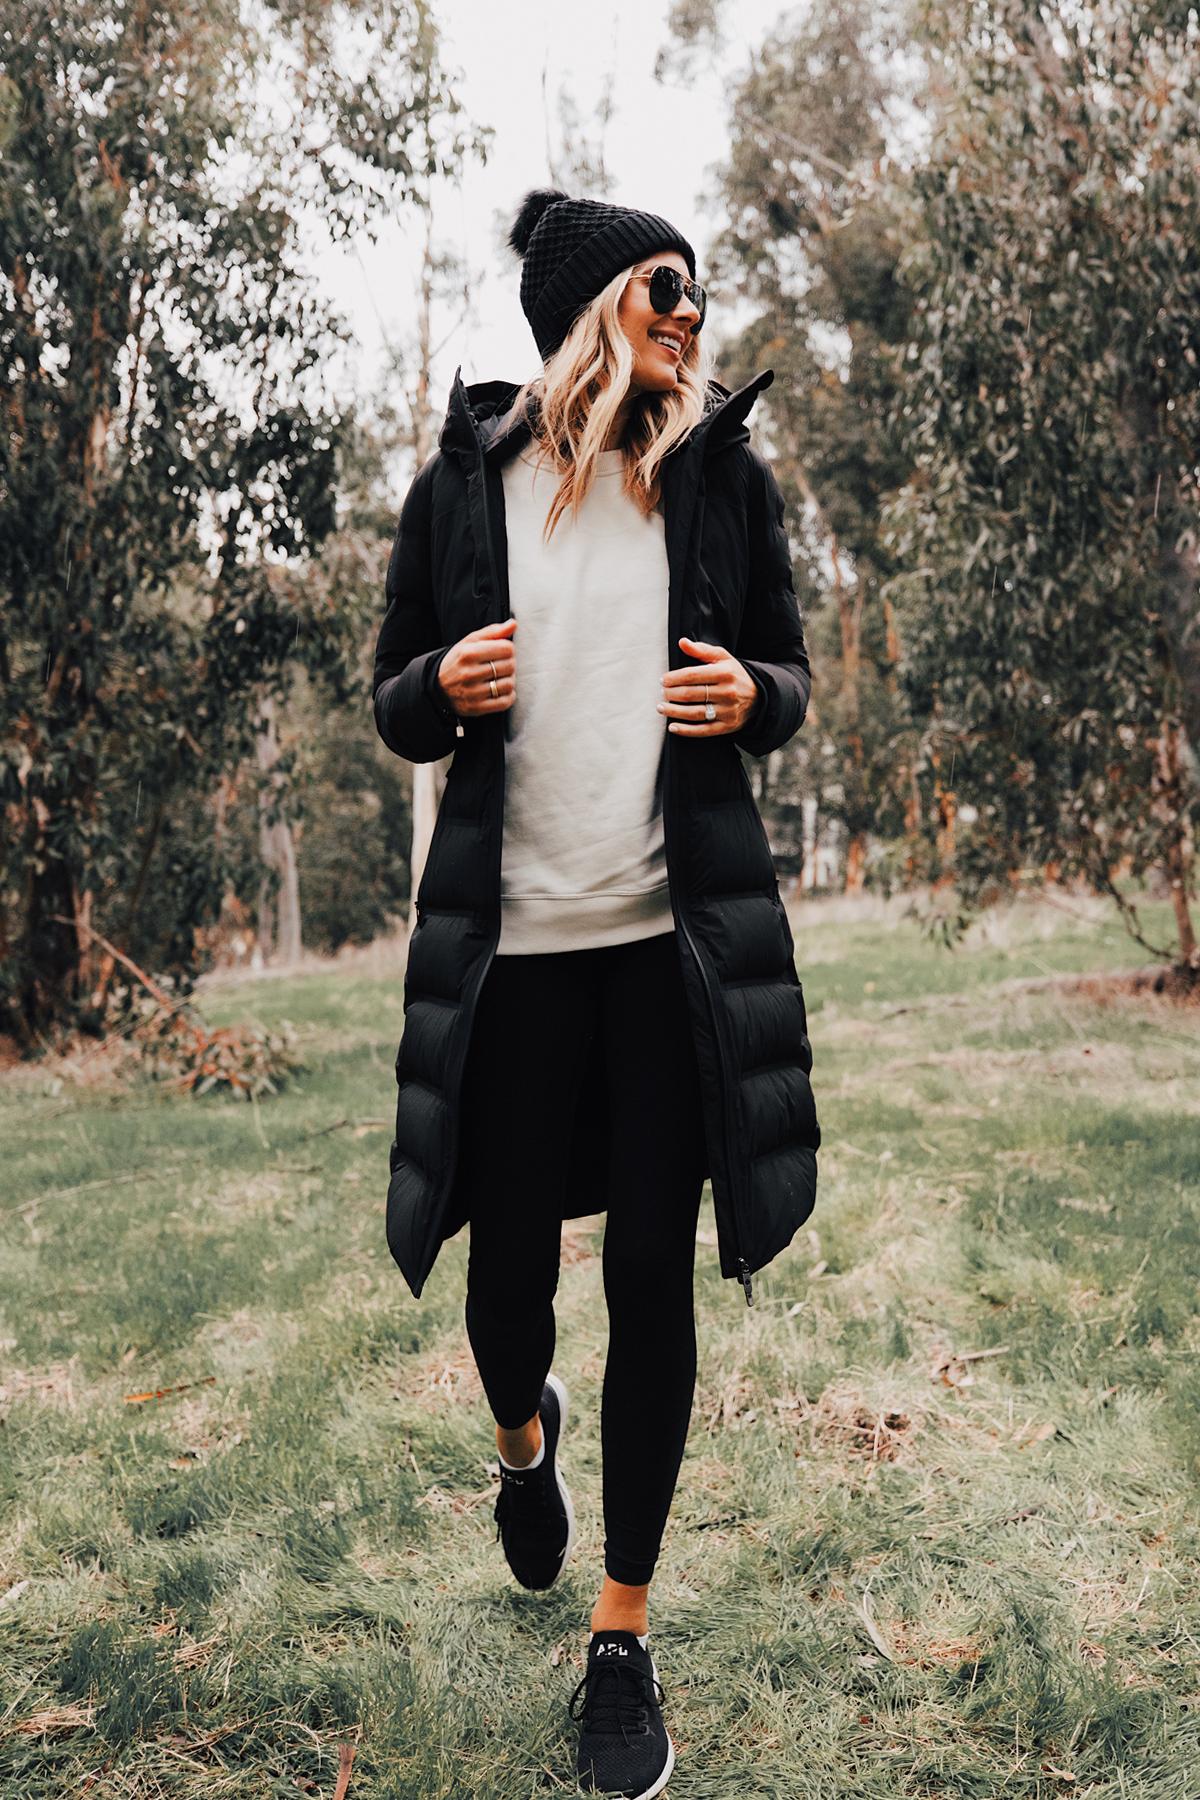 Fashion Jackson Wearing lululemon Black Sleet Street Long Jacket Black Beanie Black Leggings hikes in San Diego